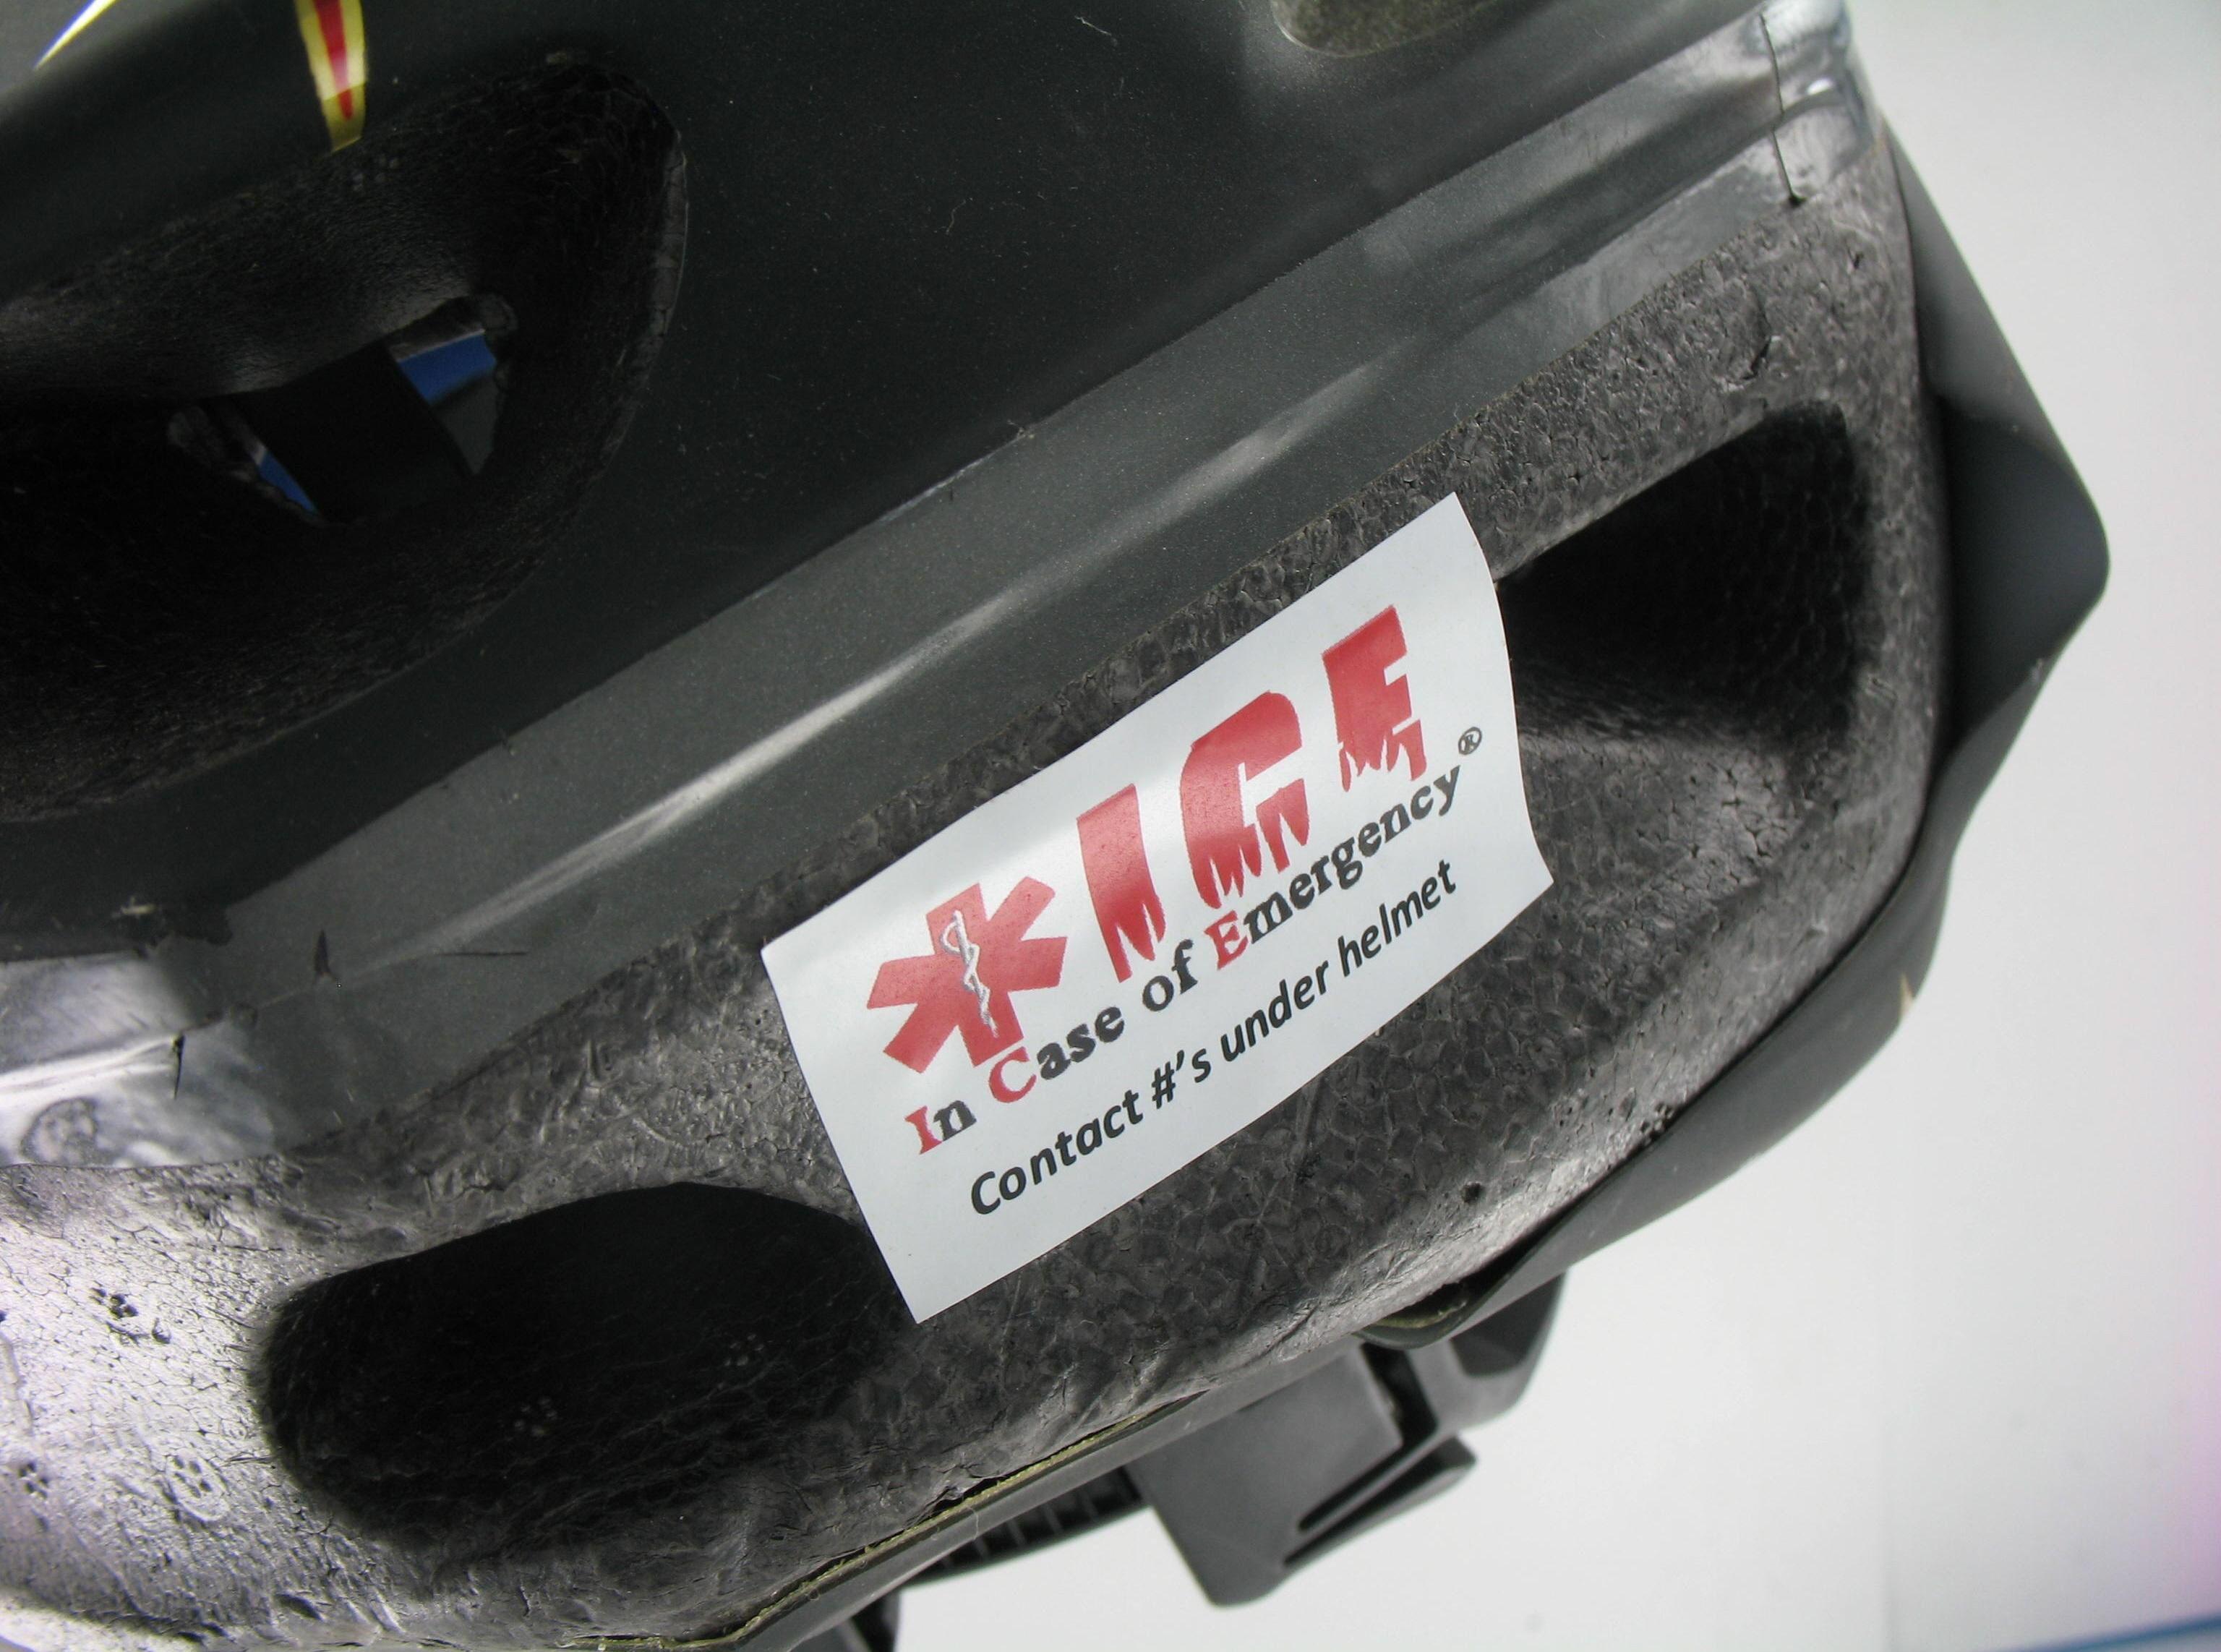 Ice indicator sticker on outside of helmet emergency